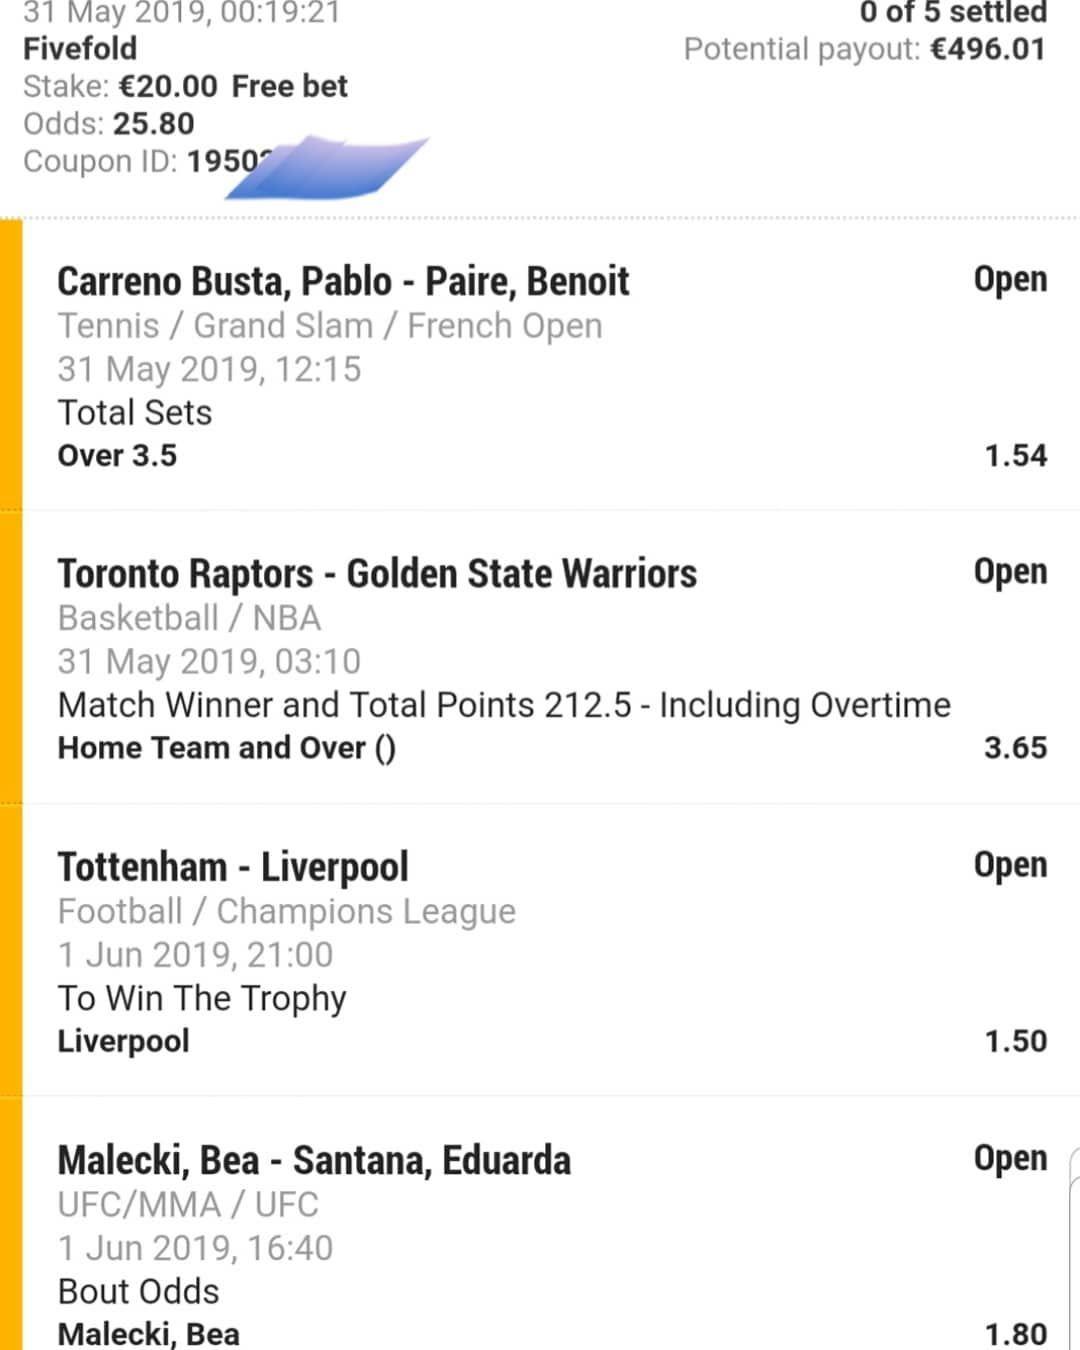 Next Night Combi Bet Goodluck All Betting Bet Bettingtips